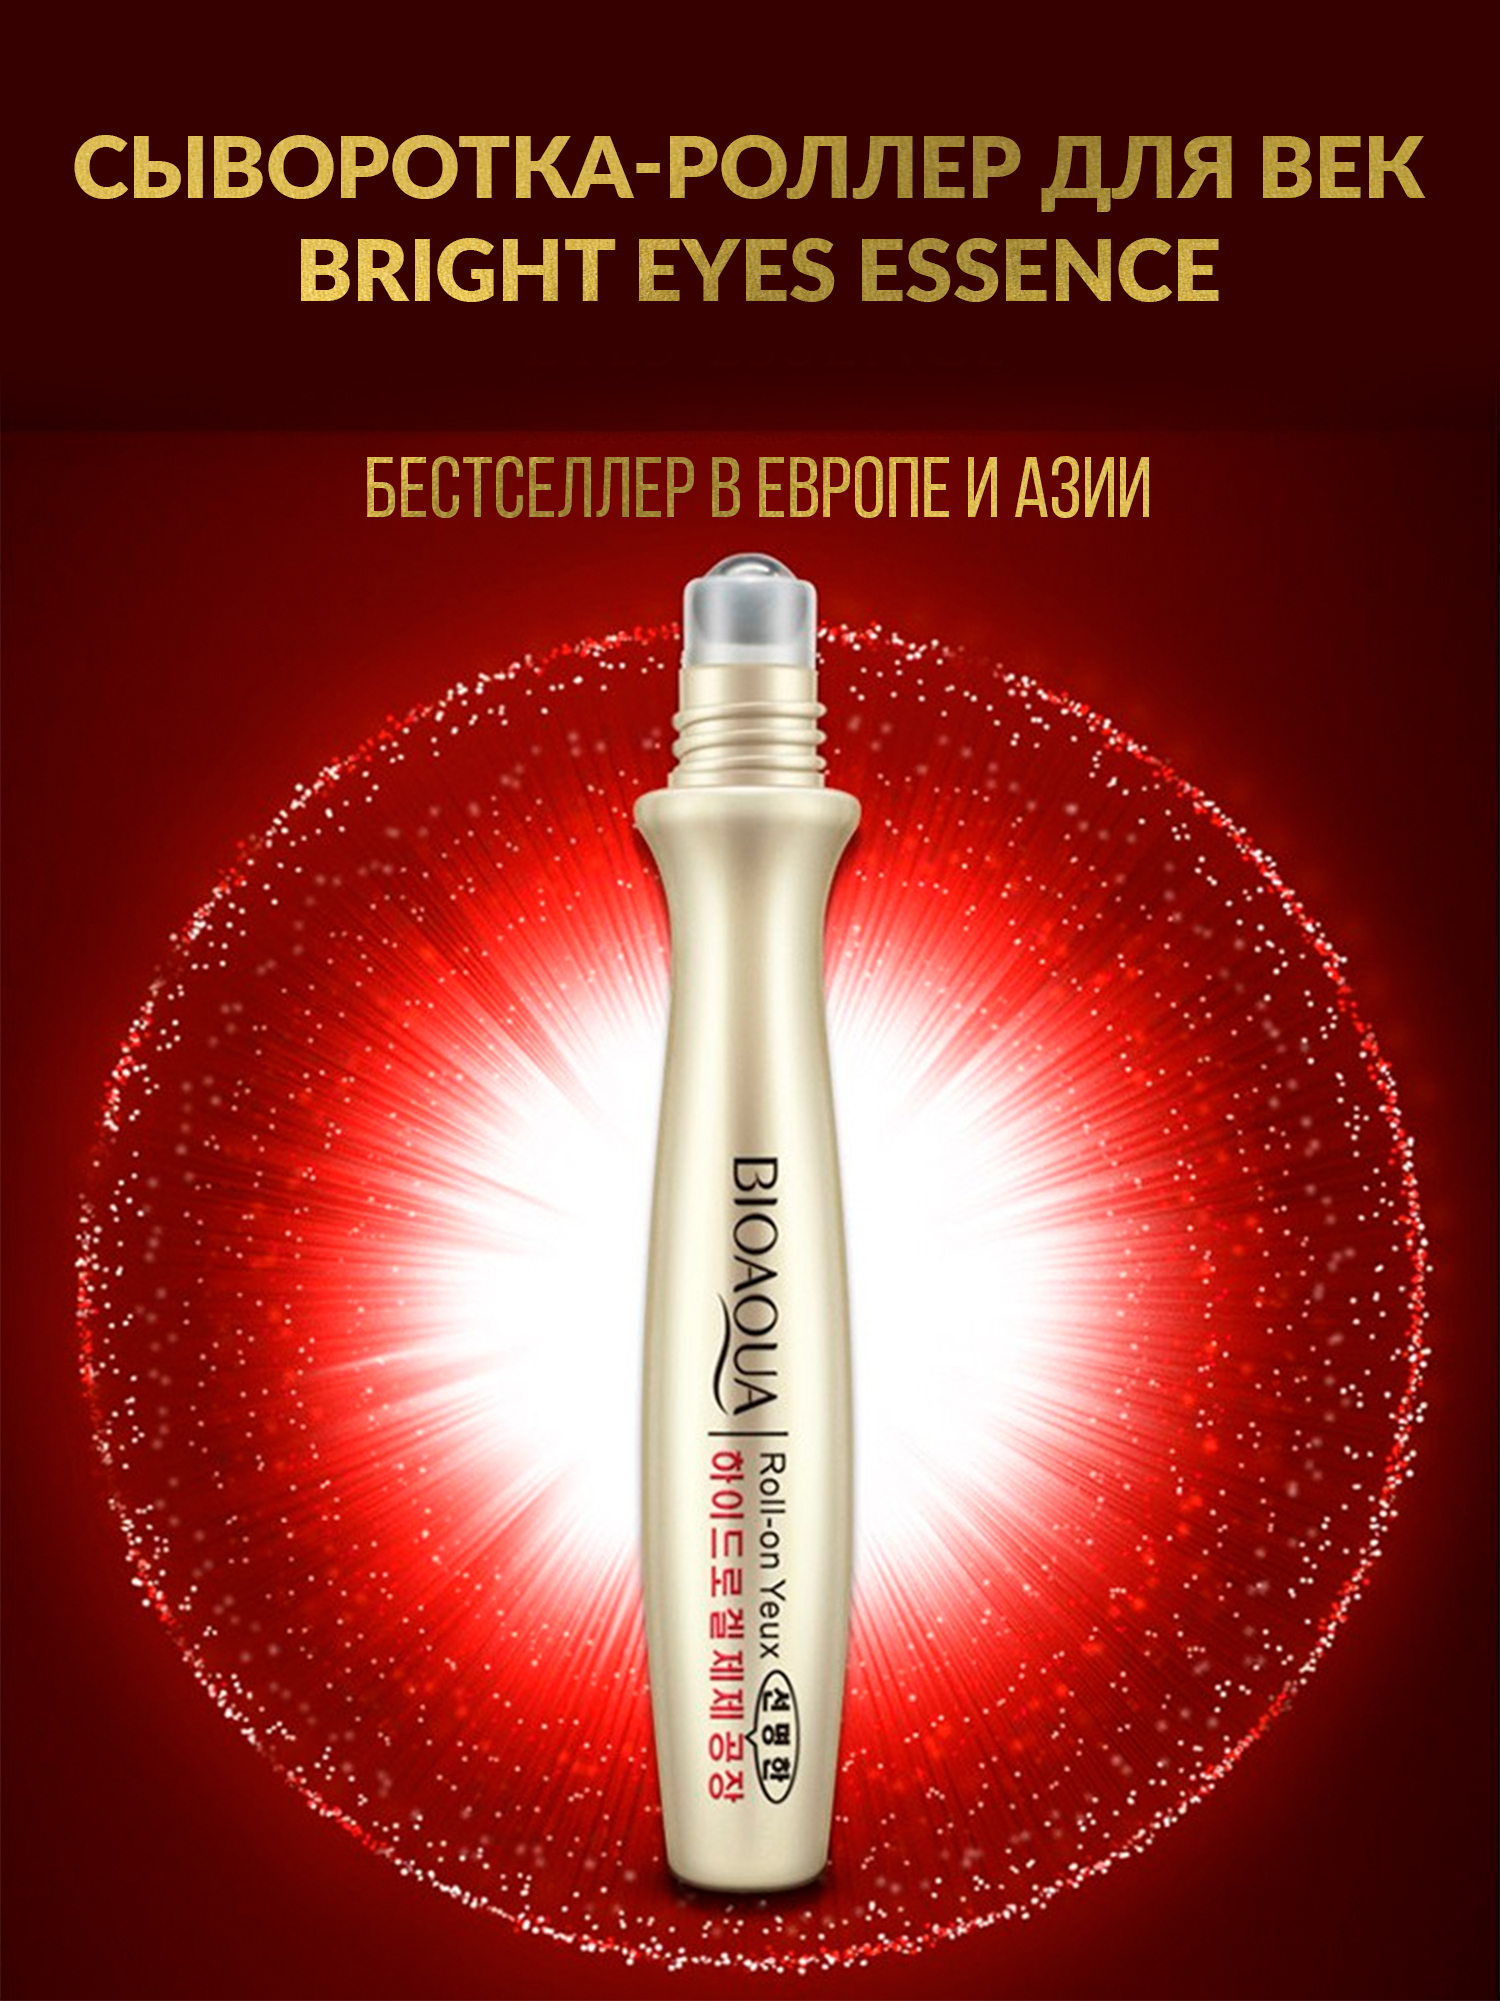 Сыворотка для век Bright Eyes Essence, 15мл